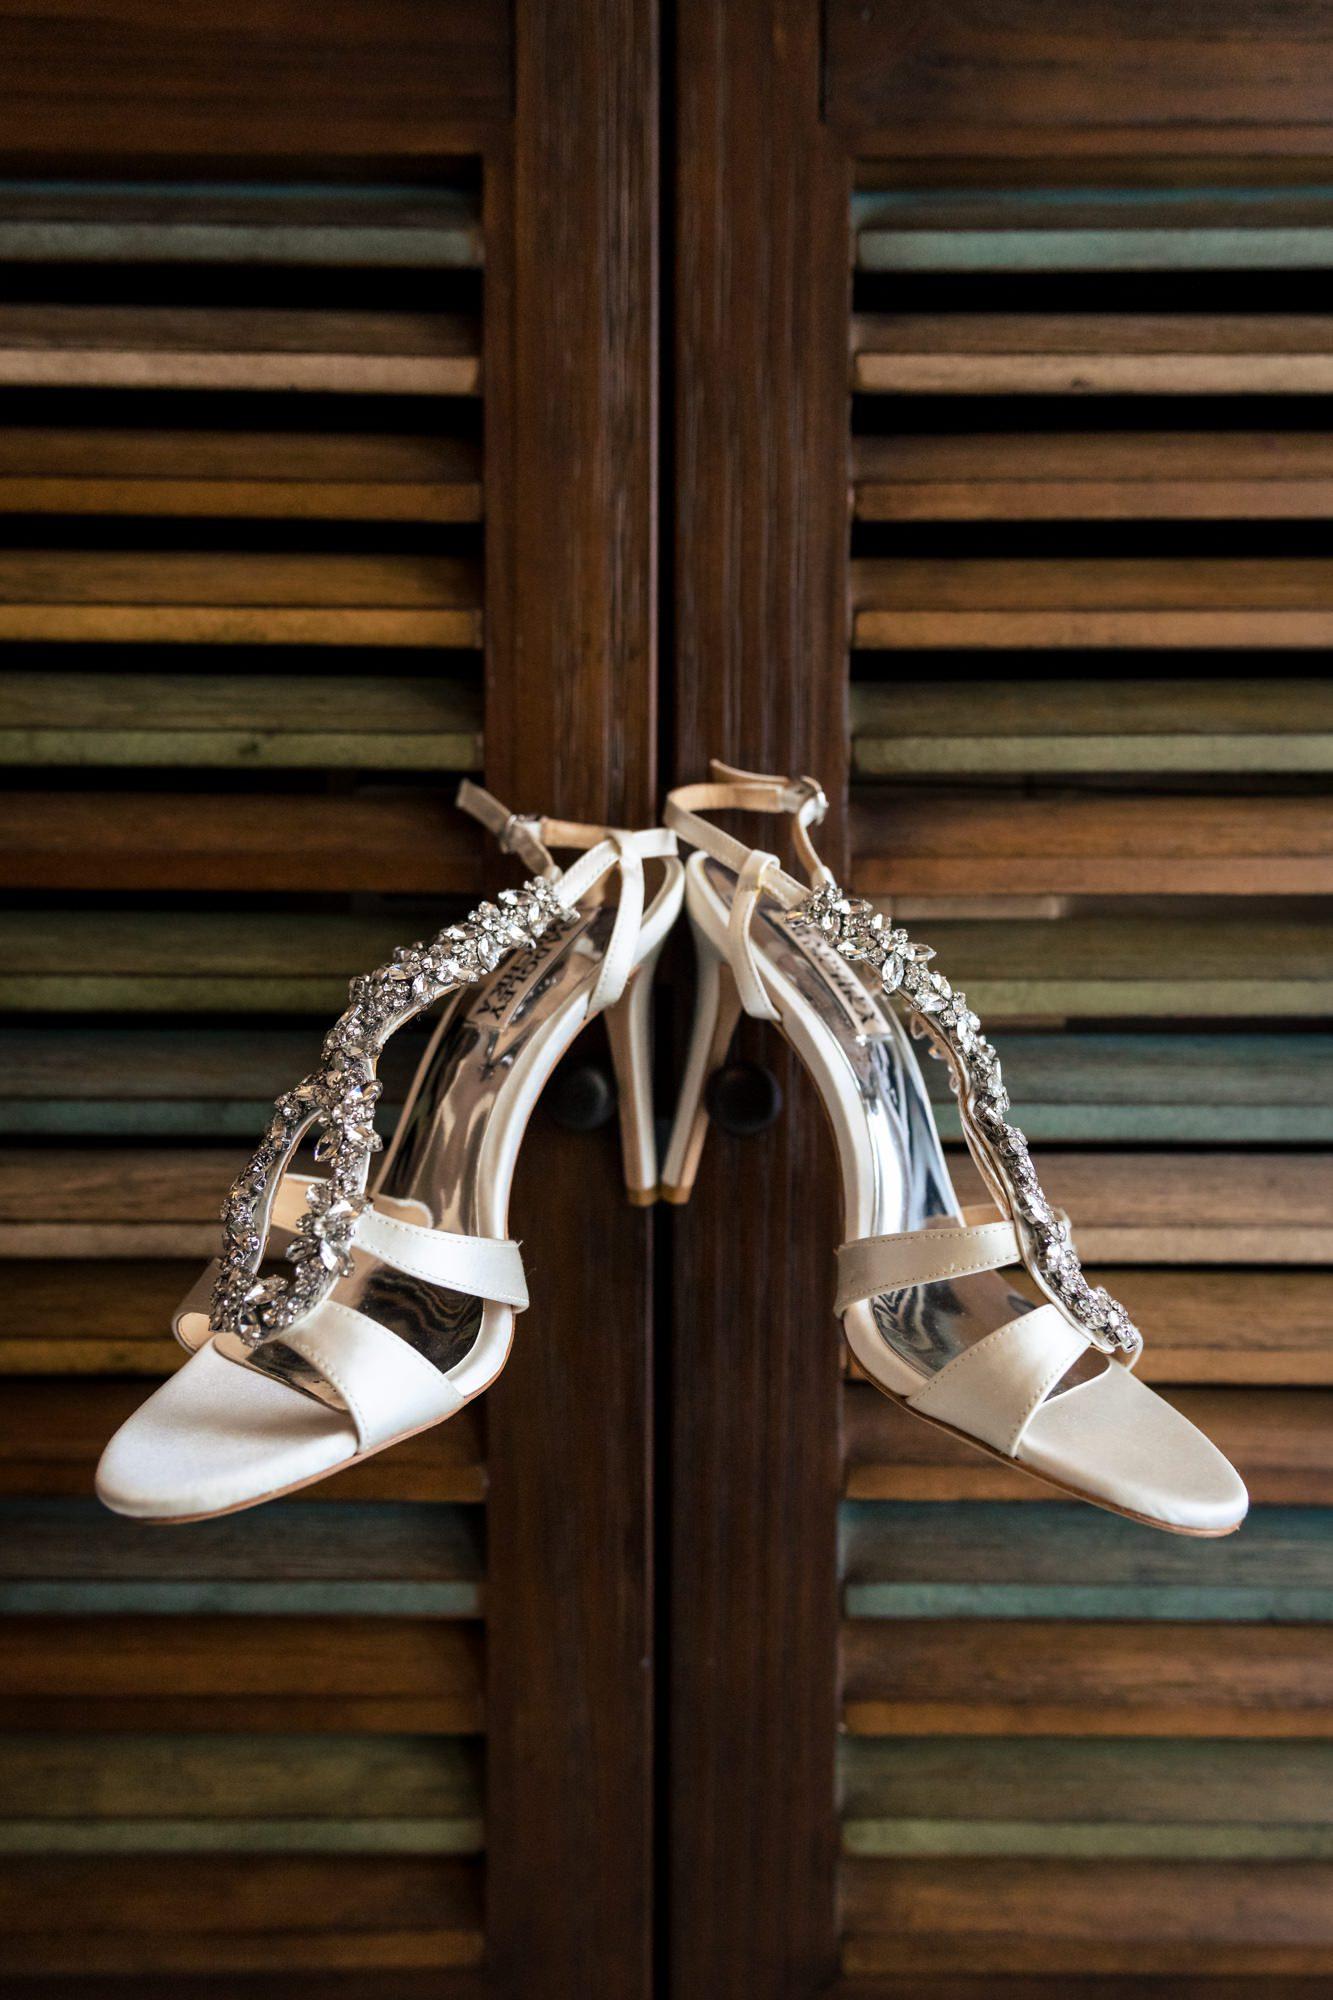 brides shoes hanging on closet